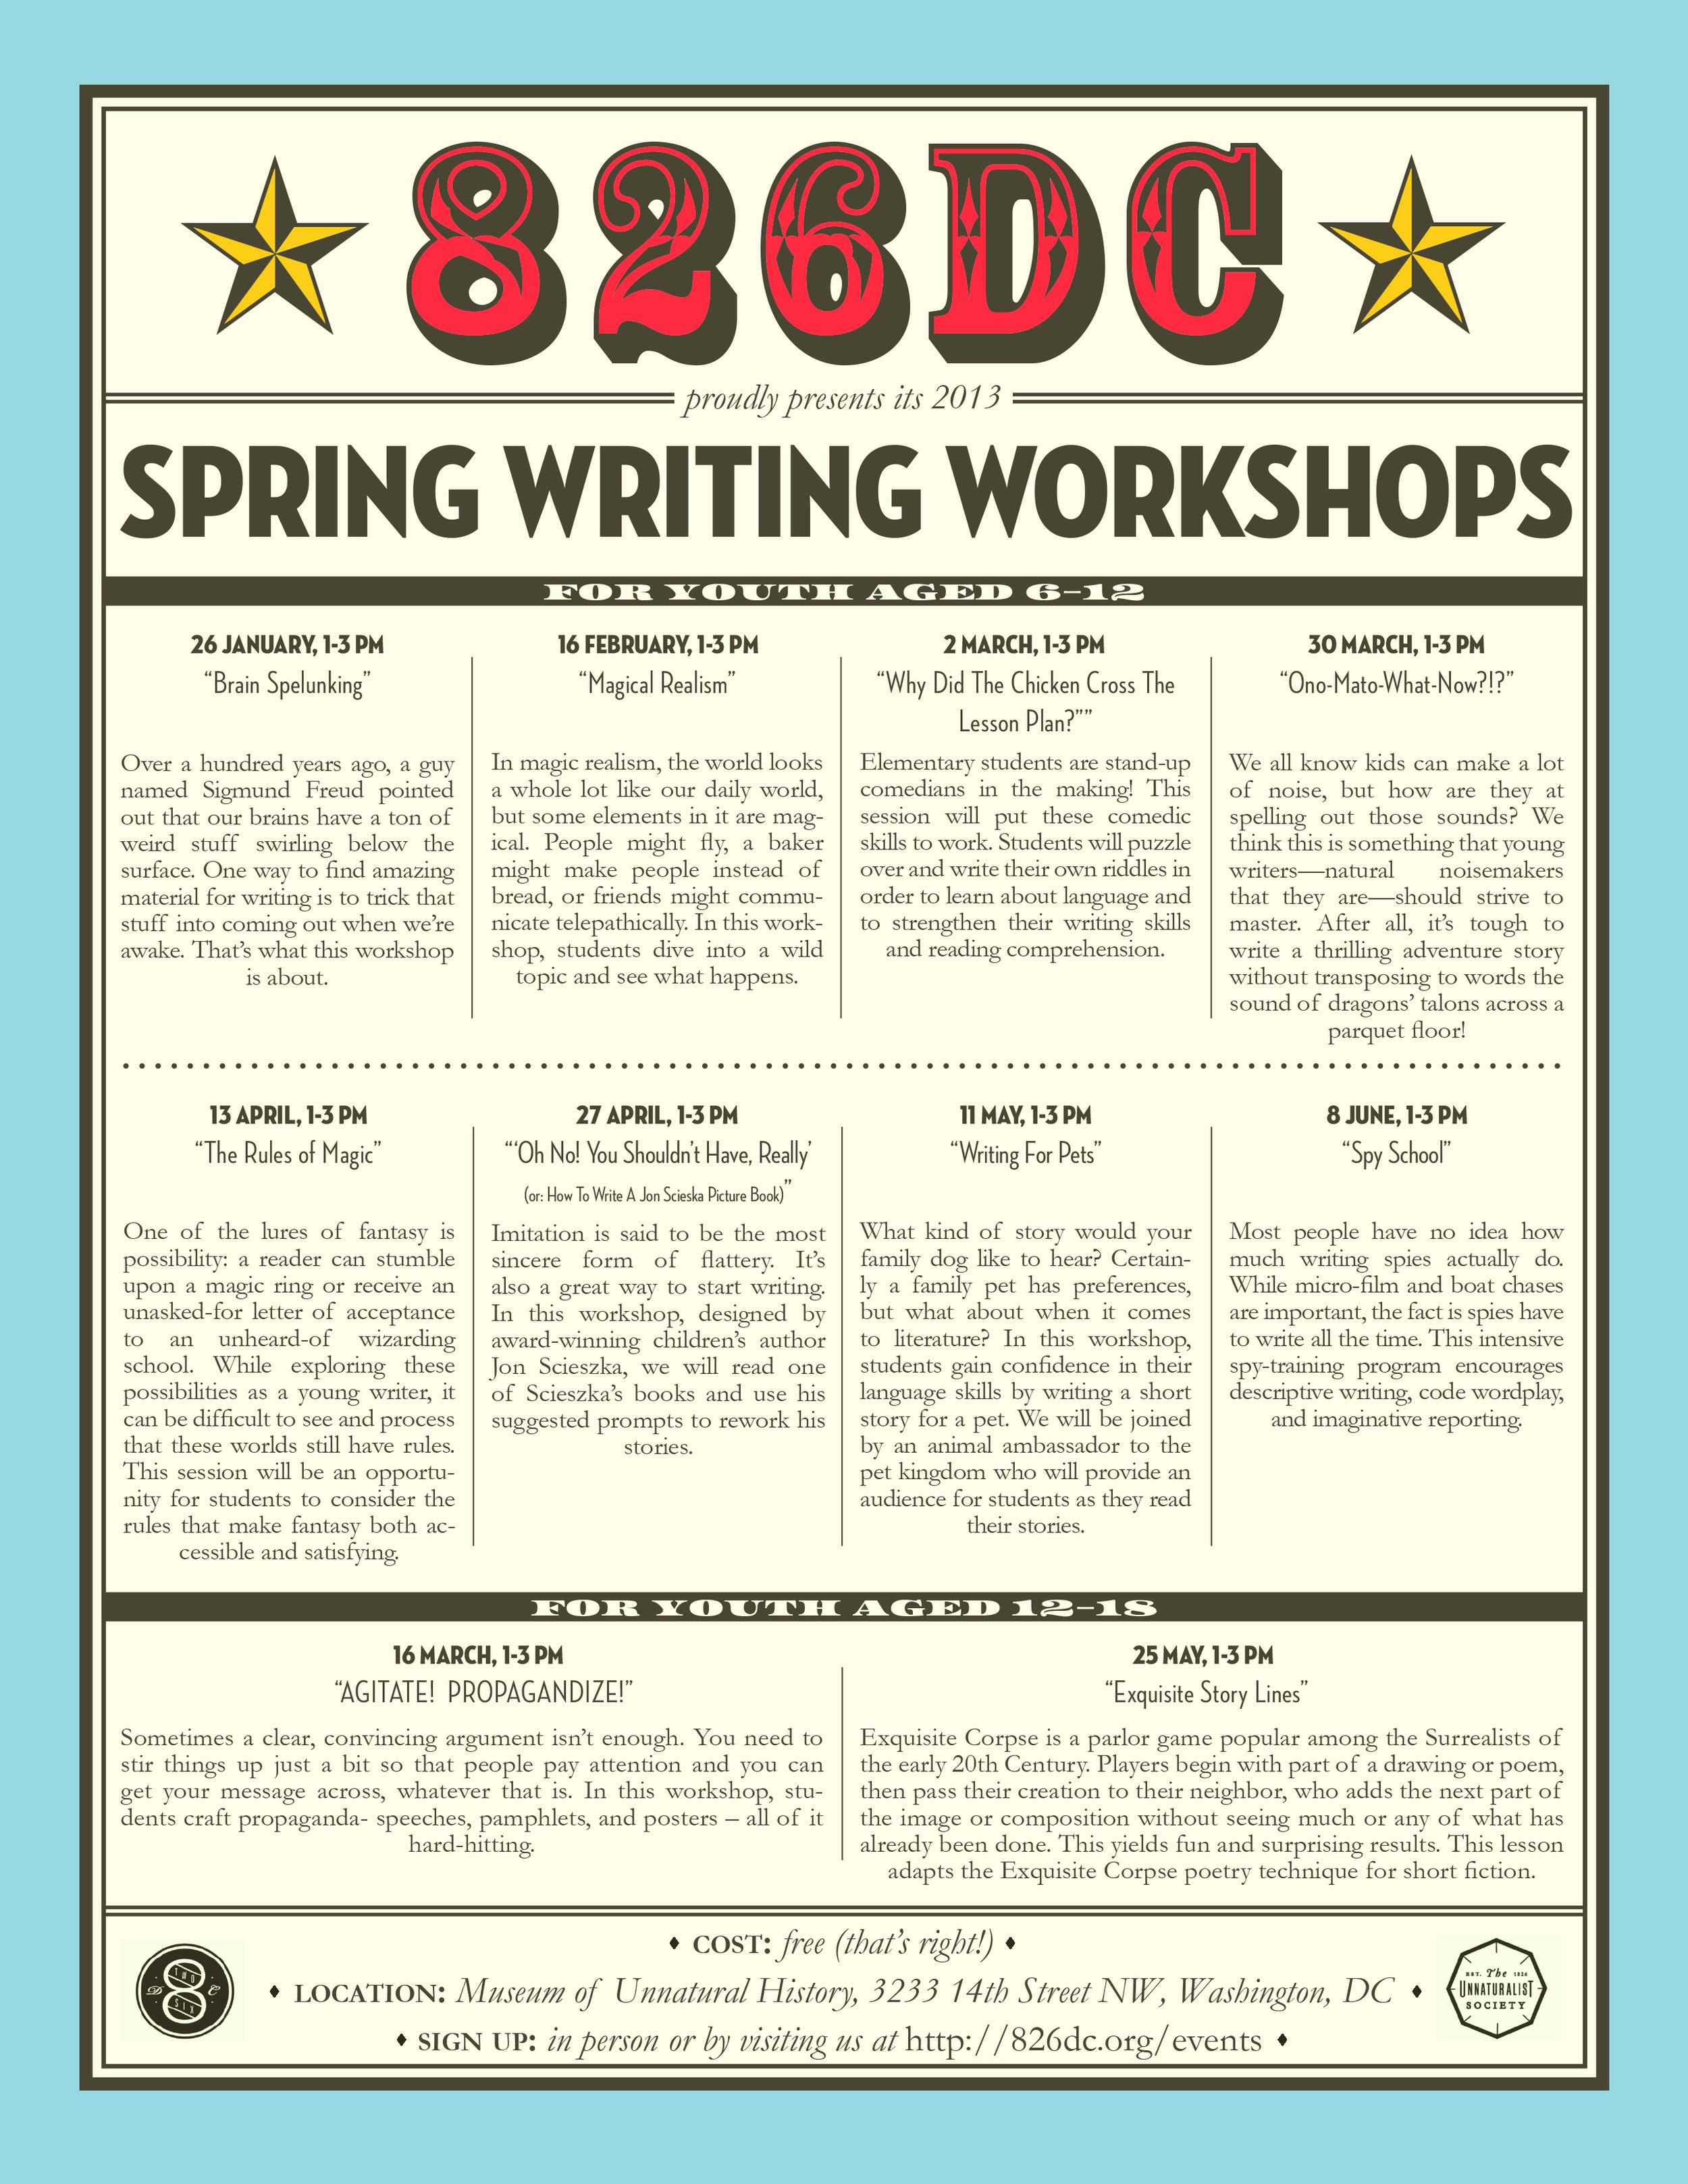 MUH spring 2013 flyer - color version.jpg